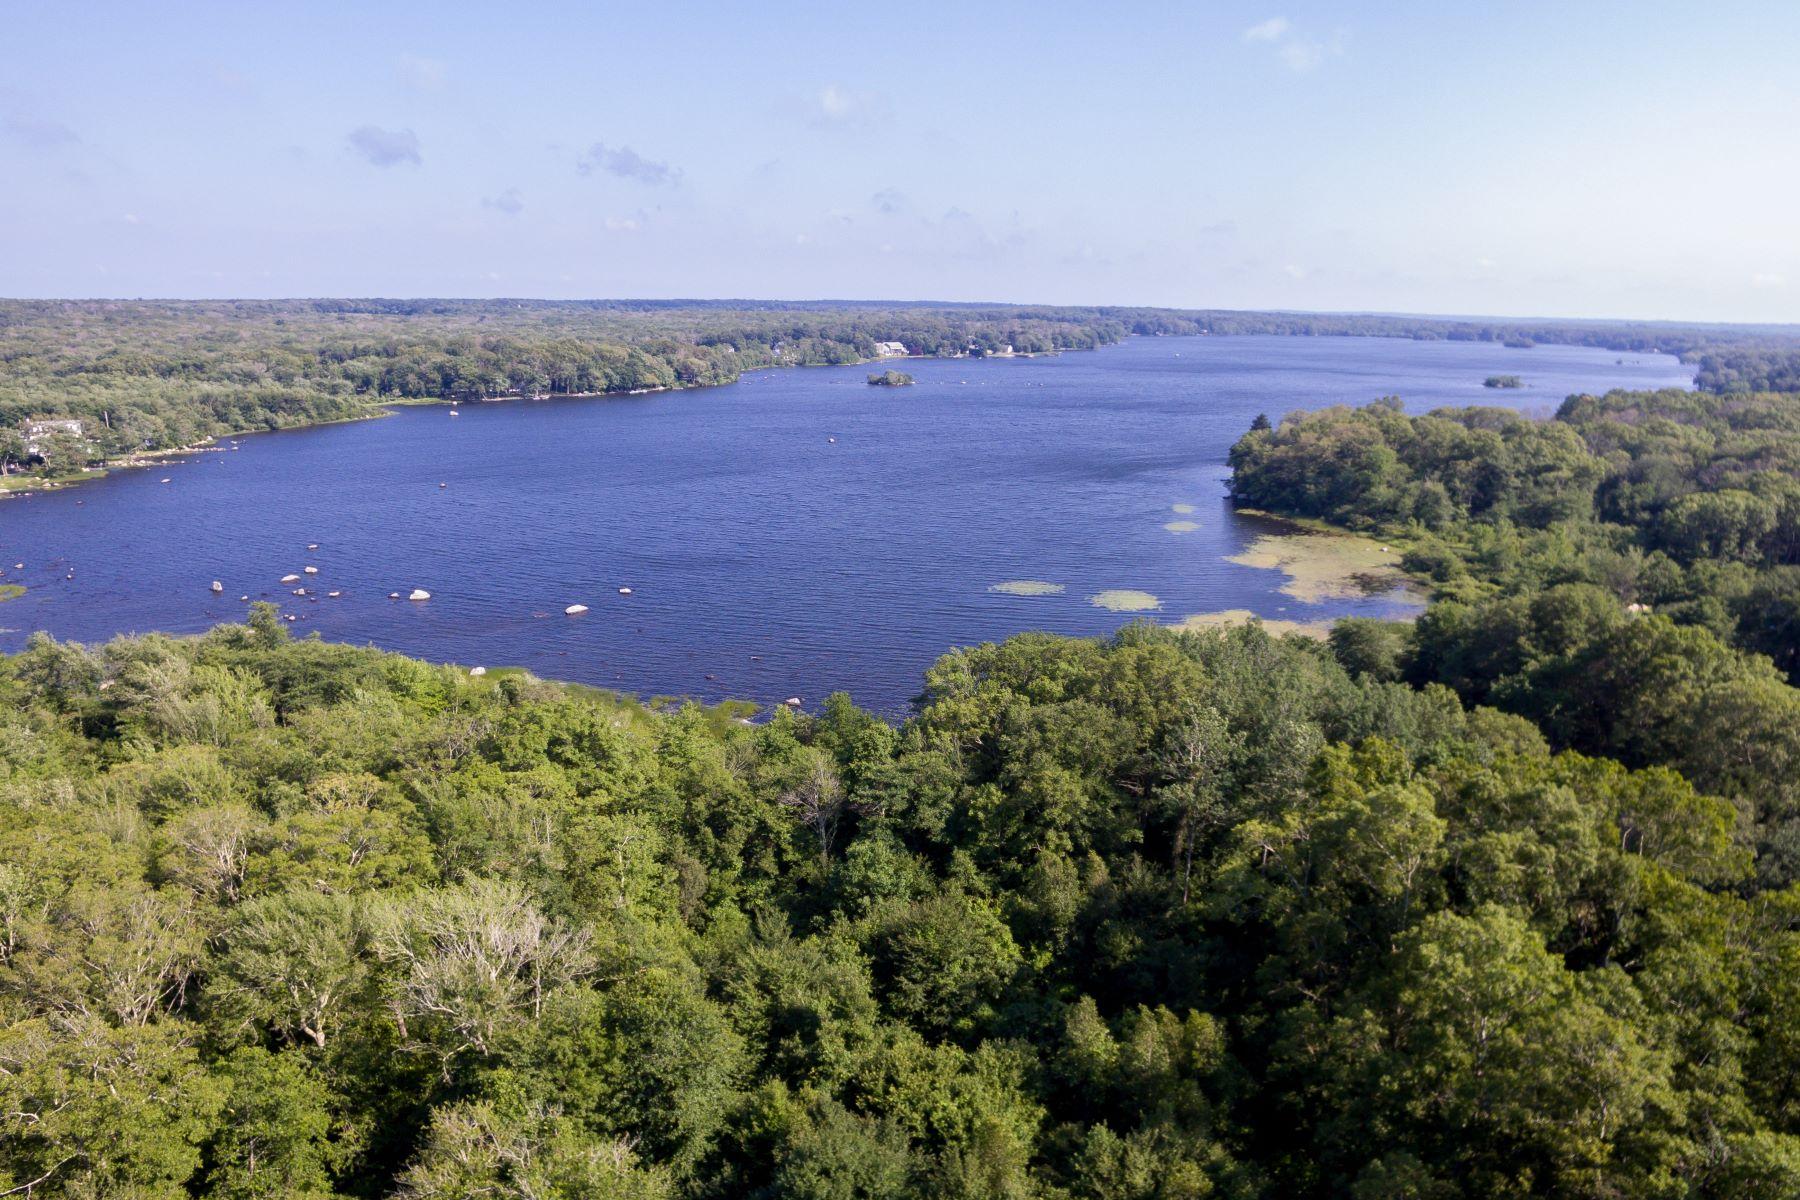 Land for Sale at 0 Bulgarmarsh Road, Tiverton, RI 0 Bulgarmarsh Road Tiverton, Rhode Island 02878 United States